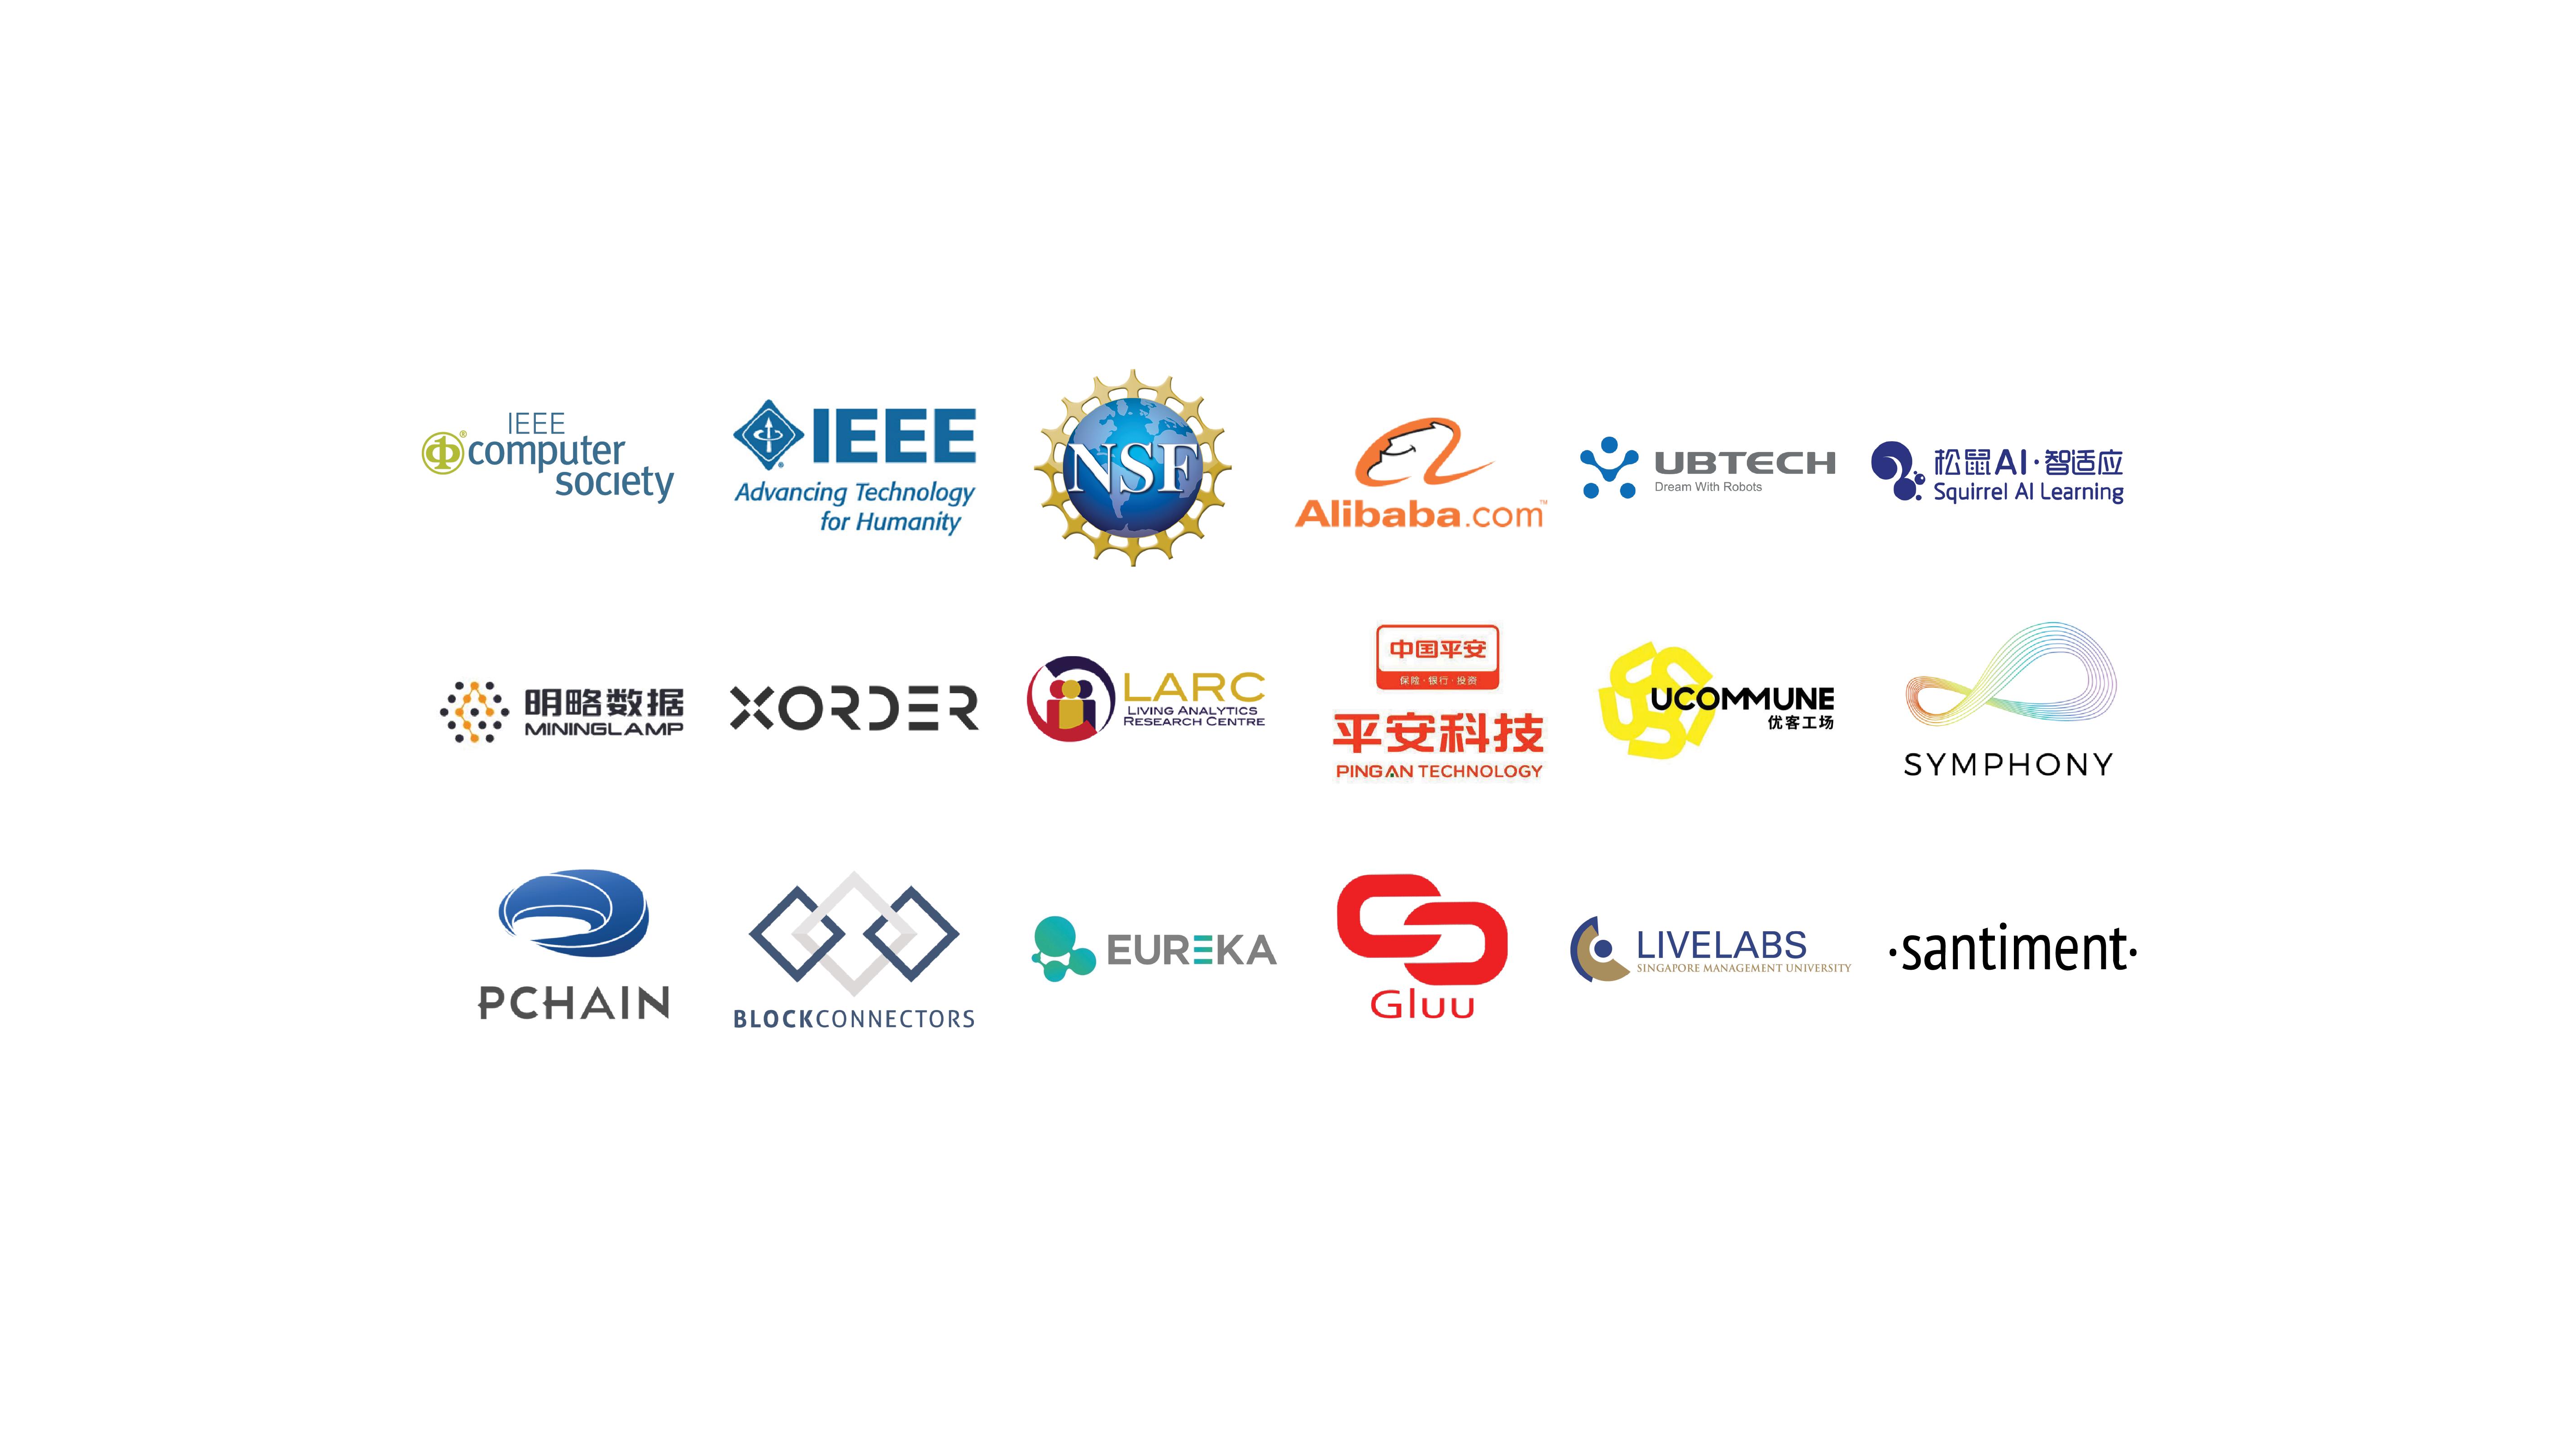 IEEE ICDM 2018 – November 17-20, 2018 in Singapore